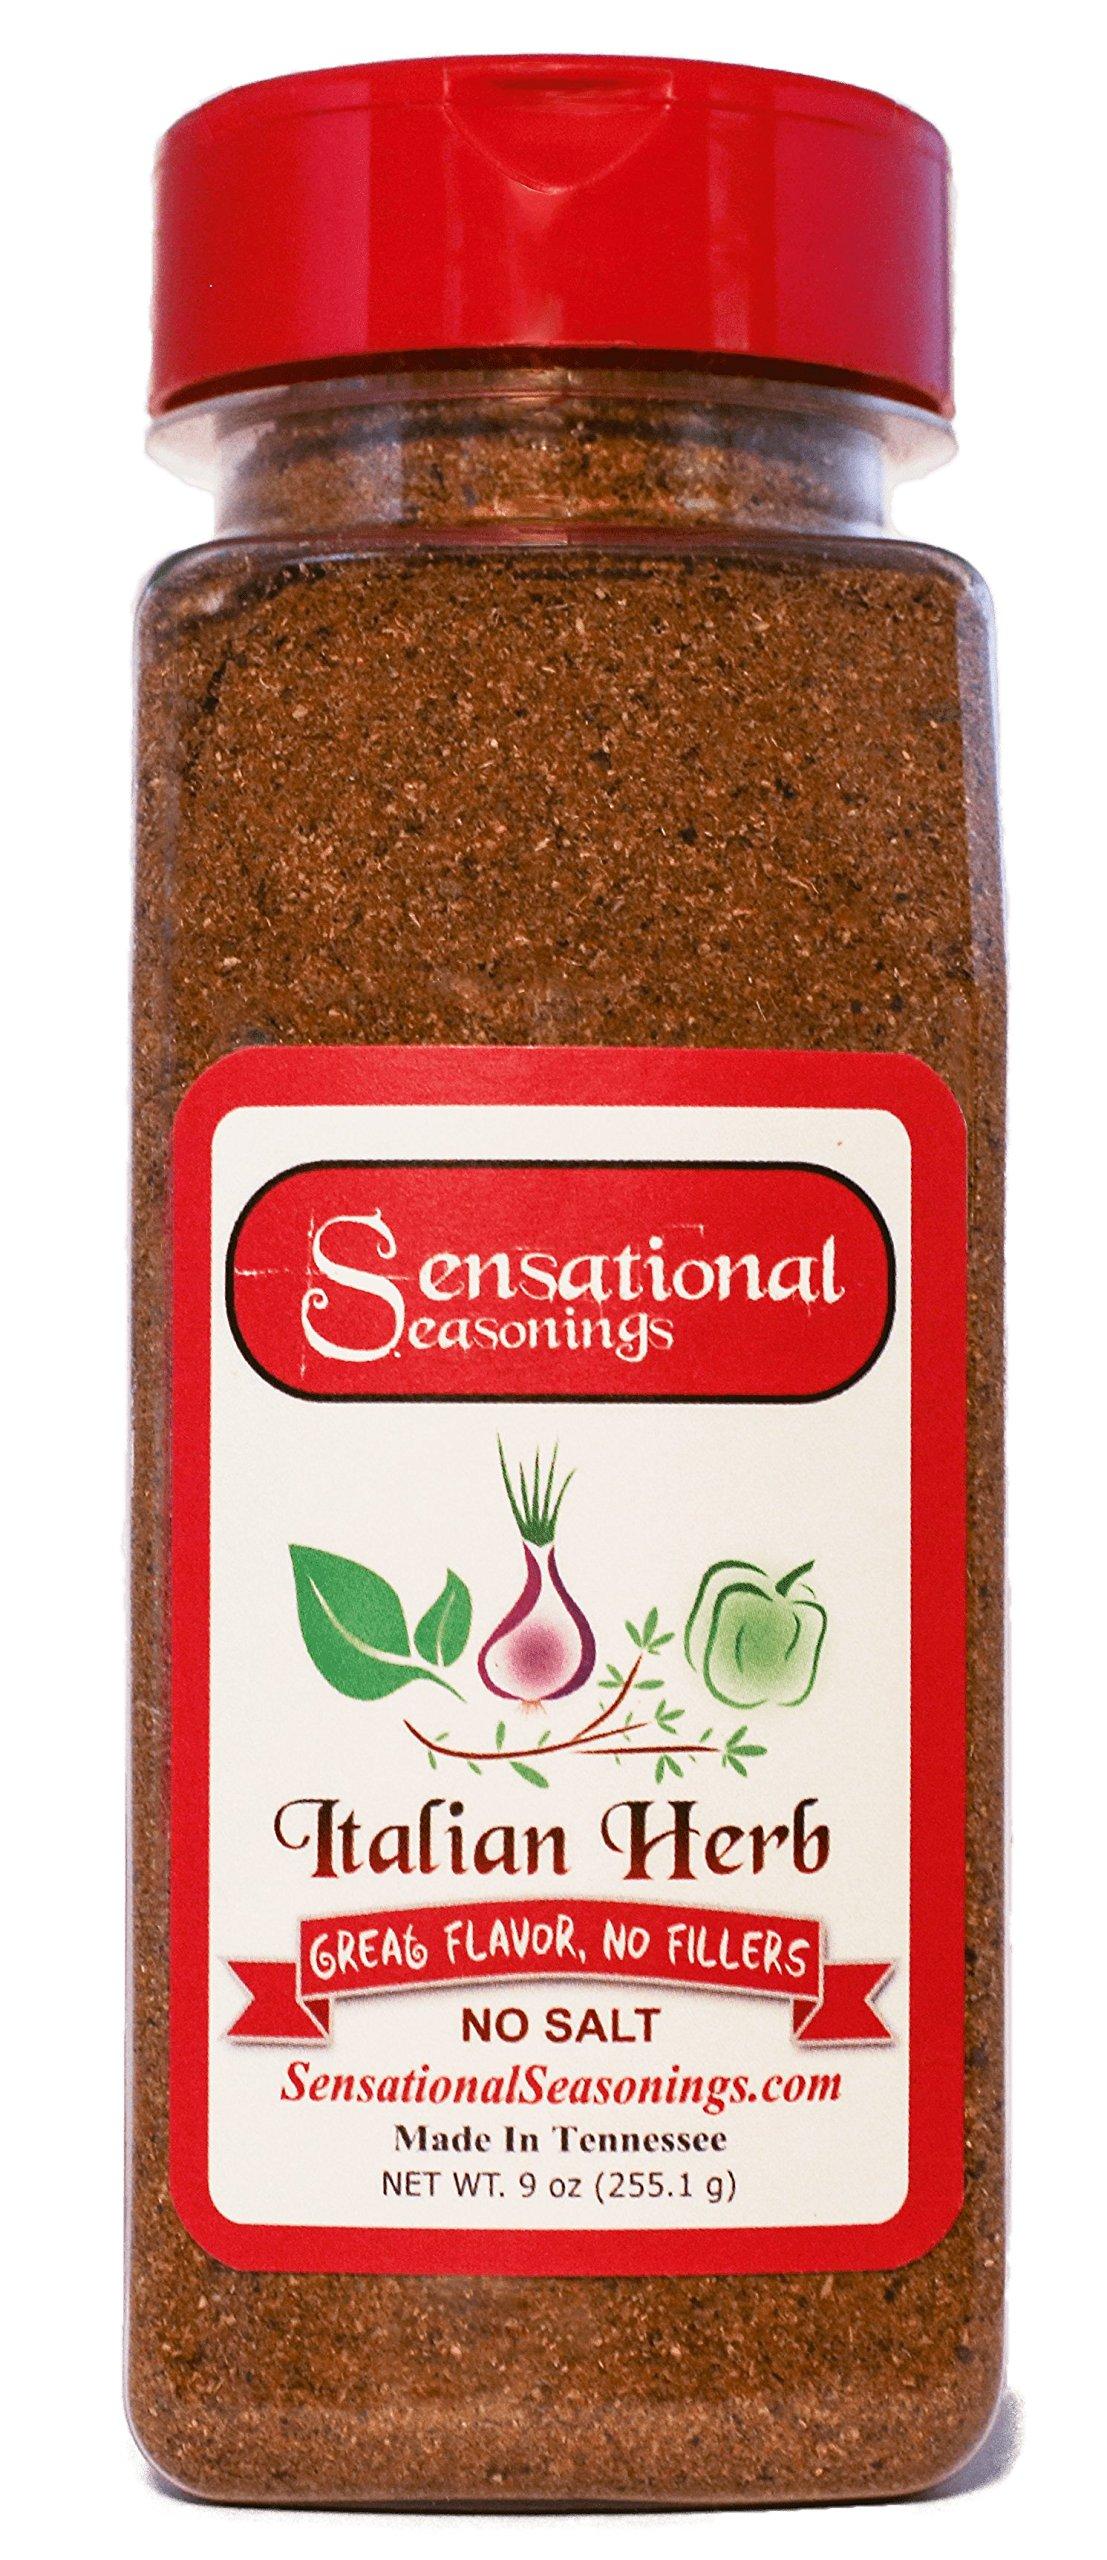 Salt-Free Italian Herb Seasoning, Sensational Seasonings, 9 oz.